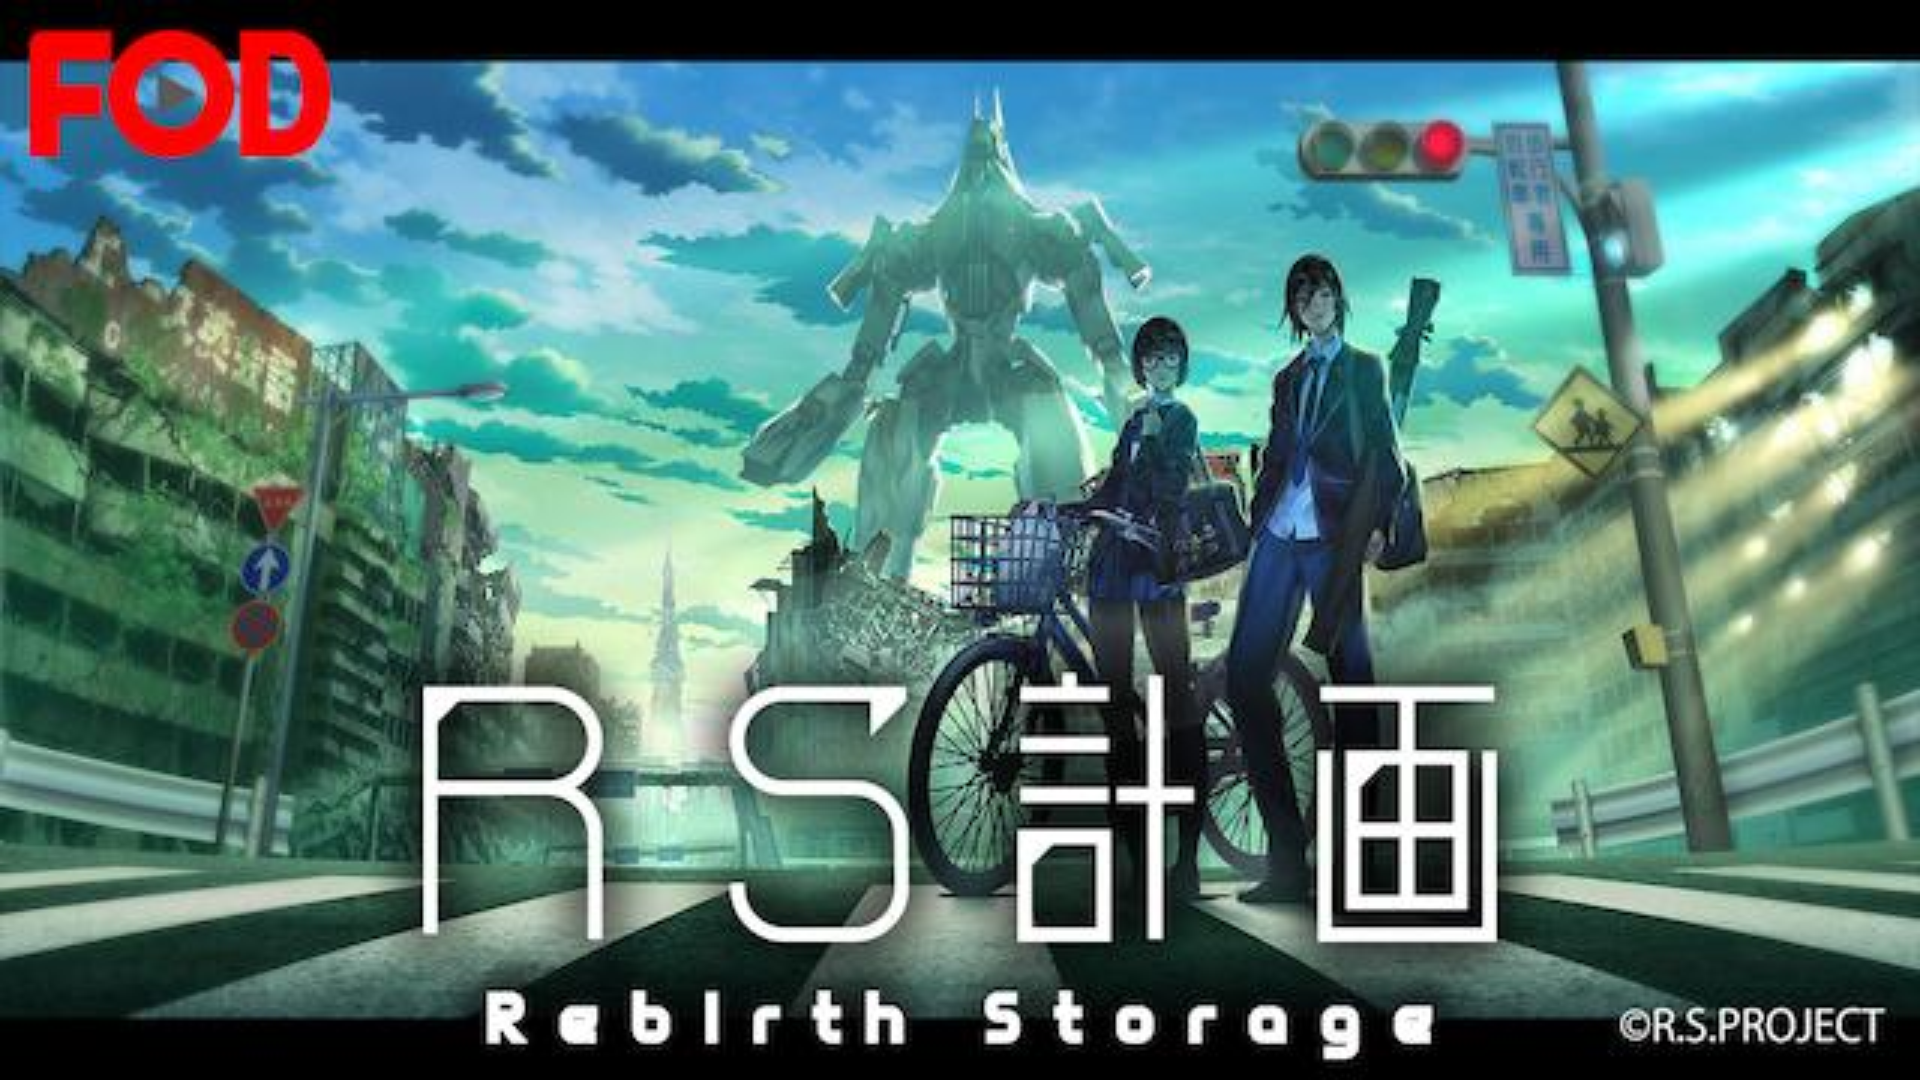 RS計画 -Rebirth Storage-